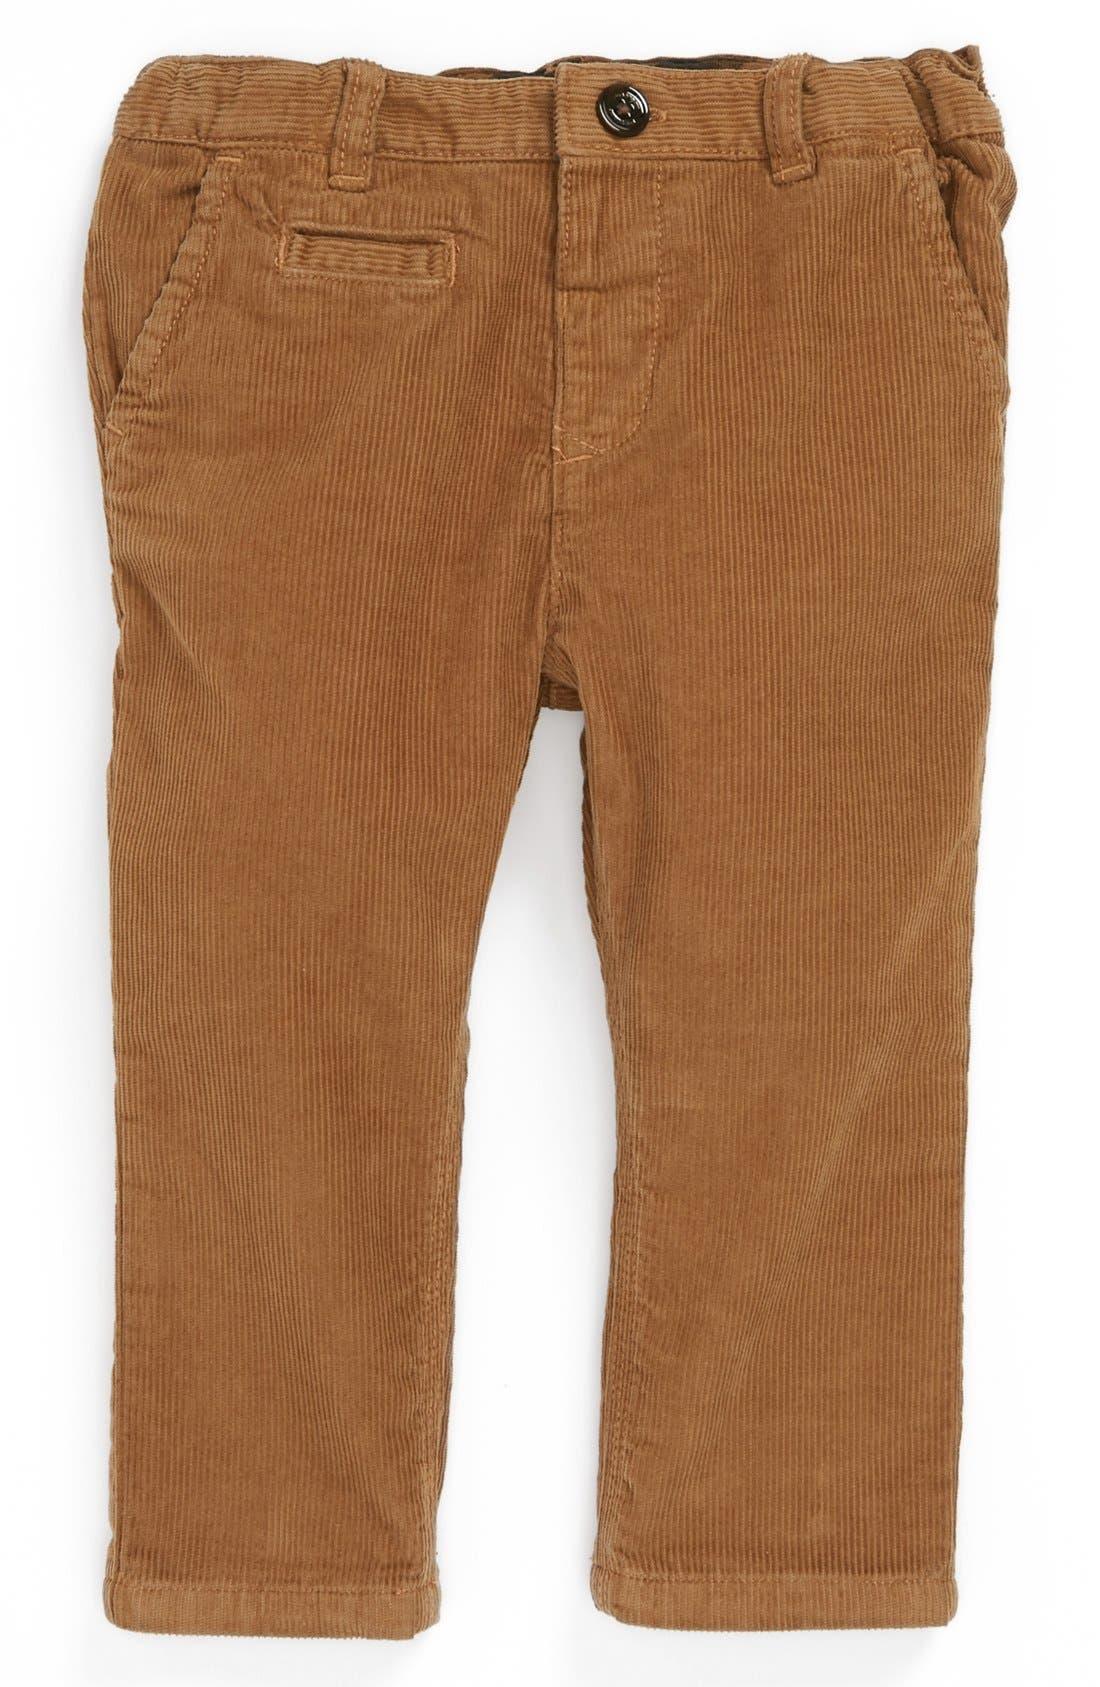 Alternate Image 1 Selected - Burberry Corduroy Pants (Baby Boys)